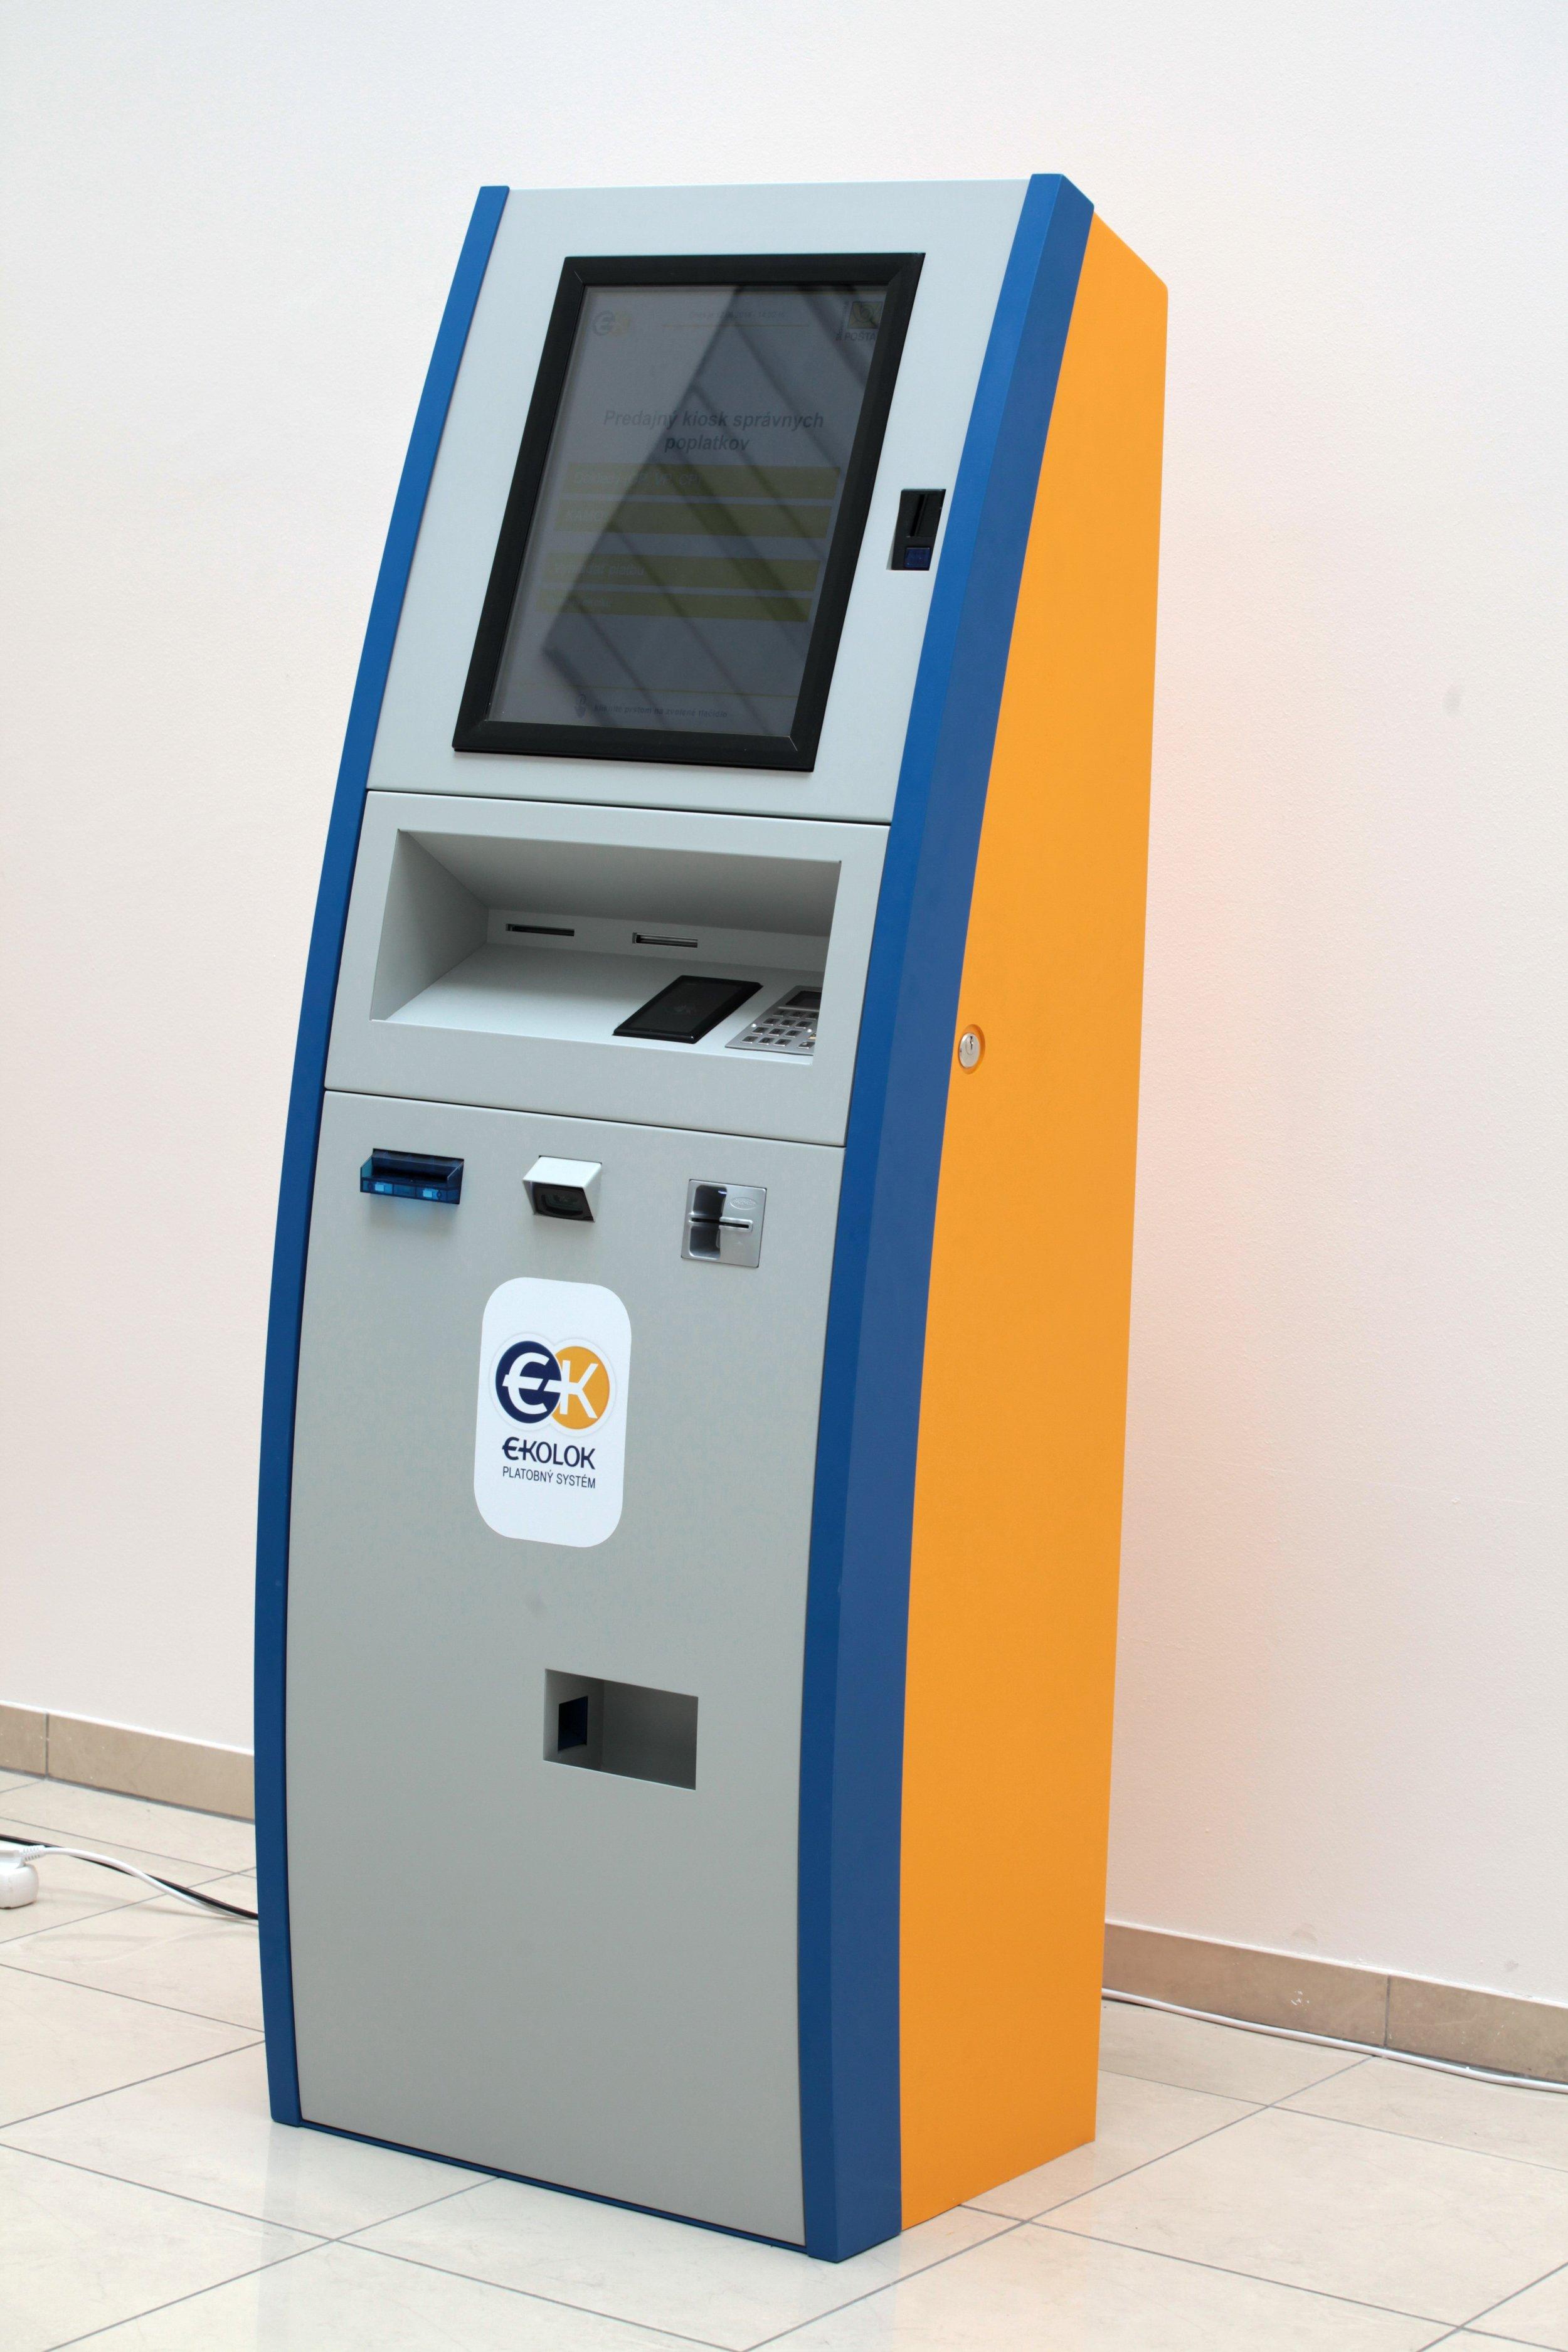 This is how the  e-Kolok kiosk  looks like